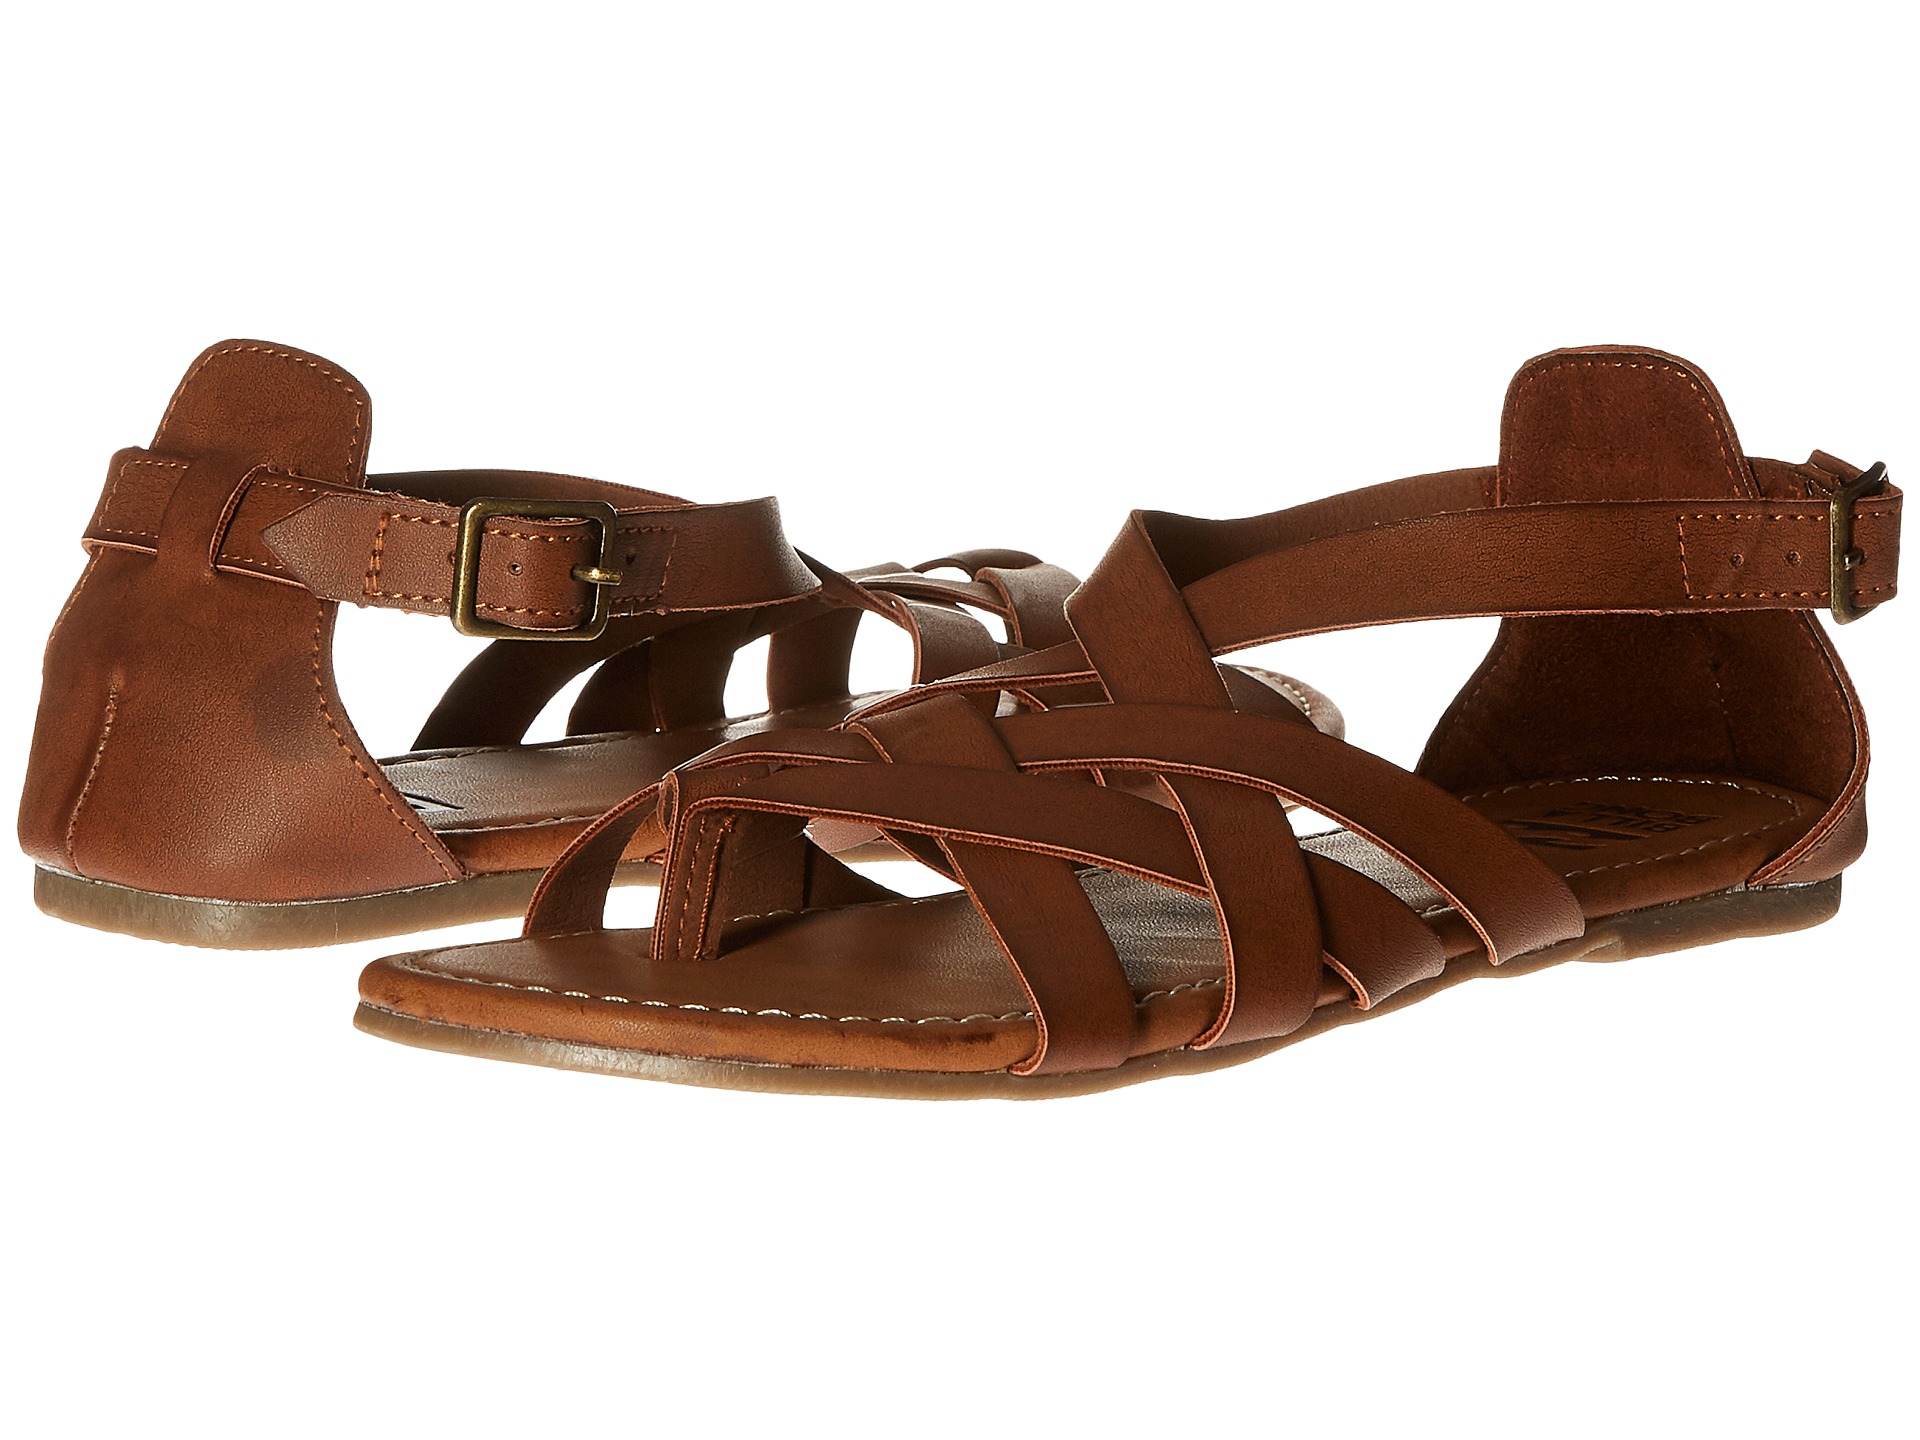 2ff2d239c Lyst - Billabong Seaing Double Sandal in Brown